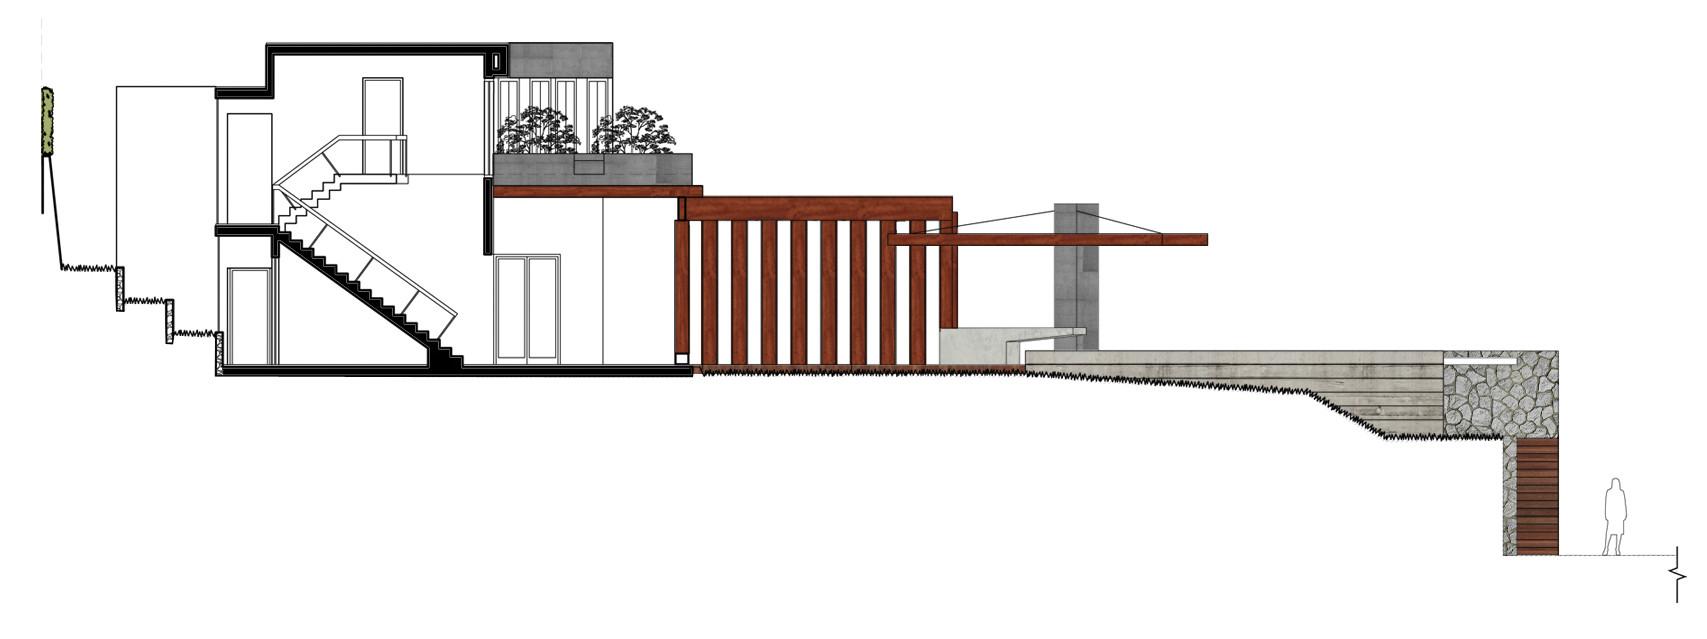 Gallery Of Cyd House V Oid 10